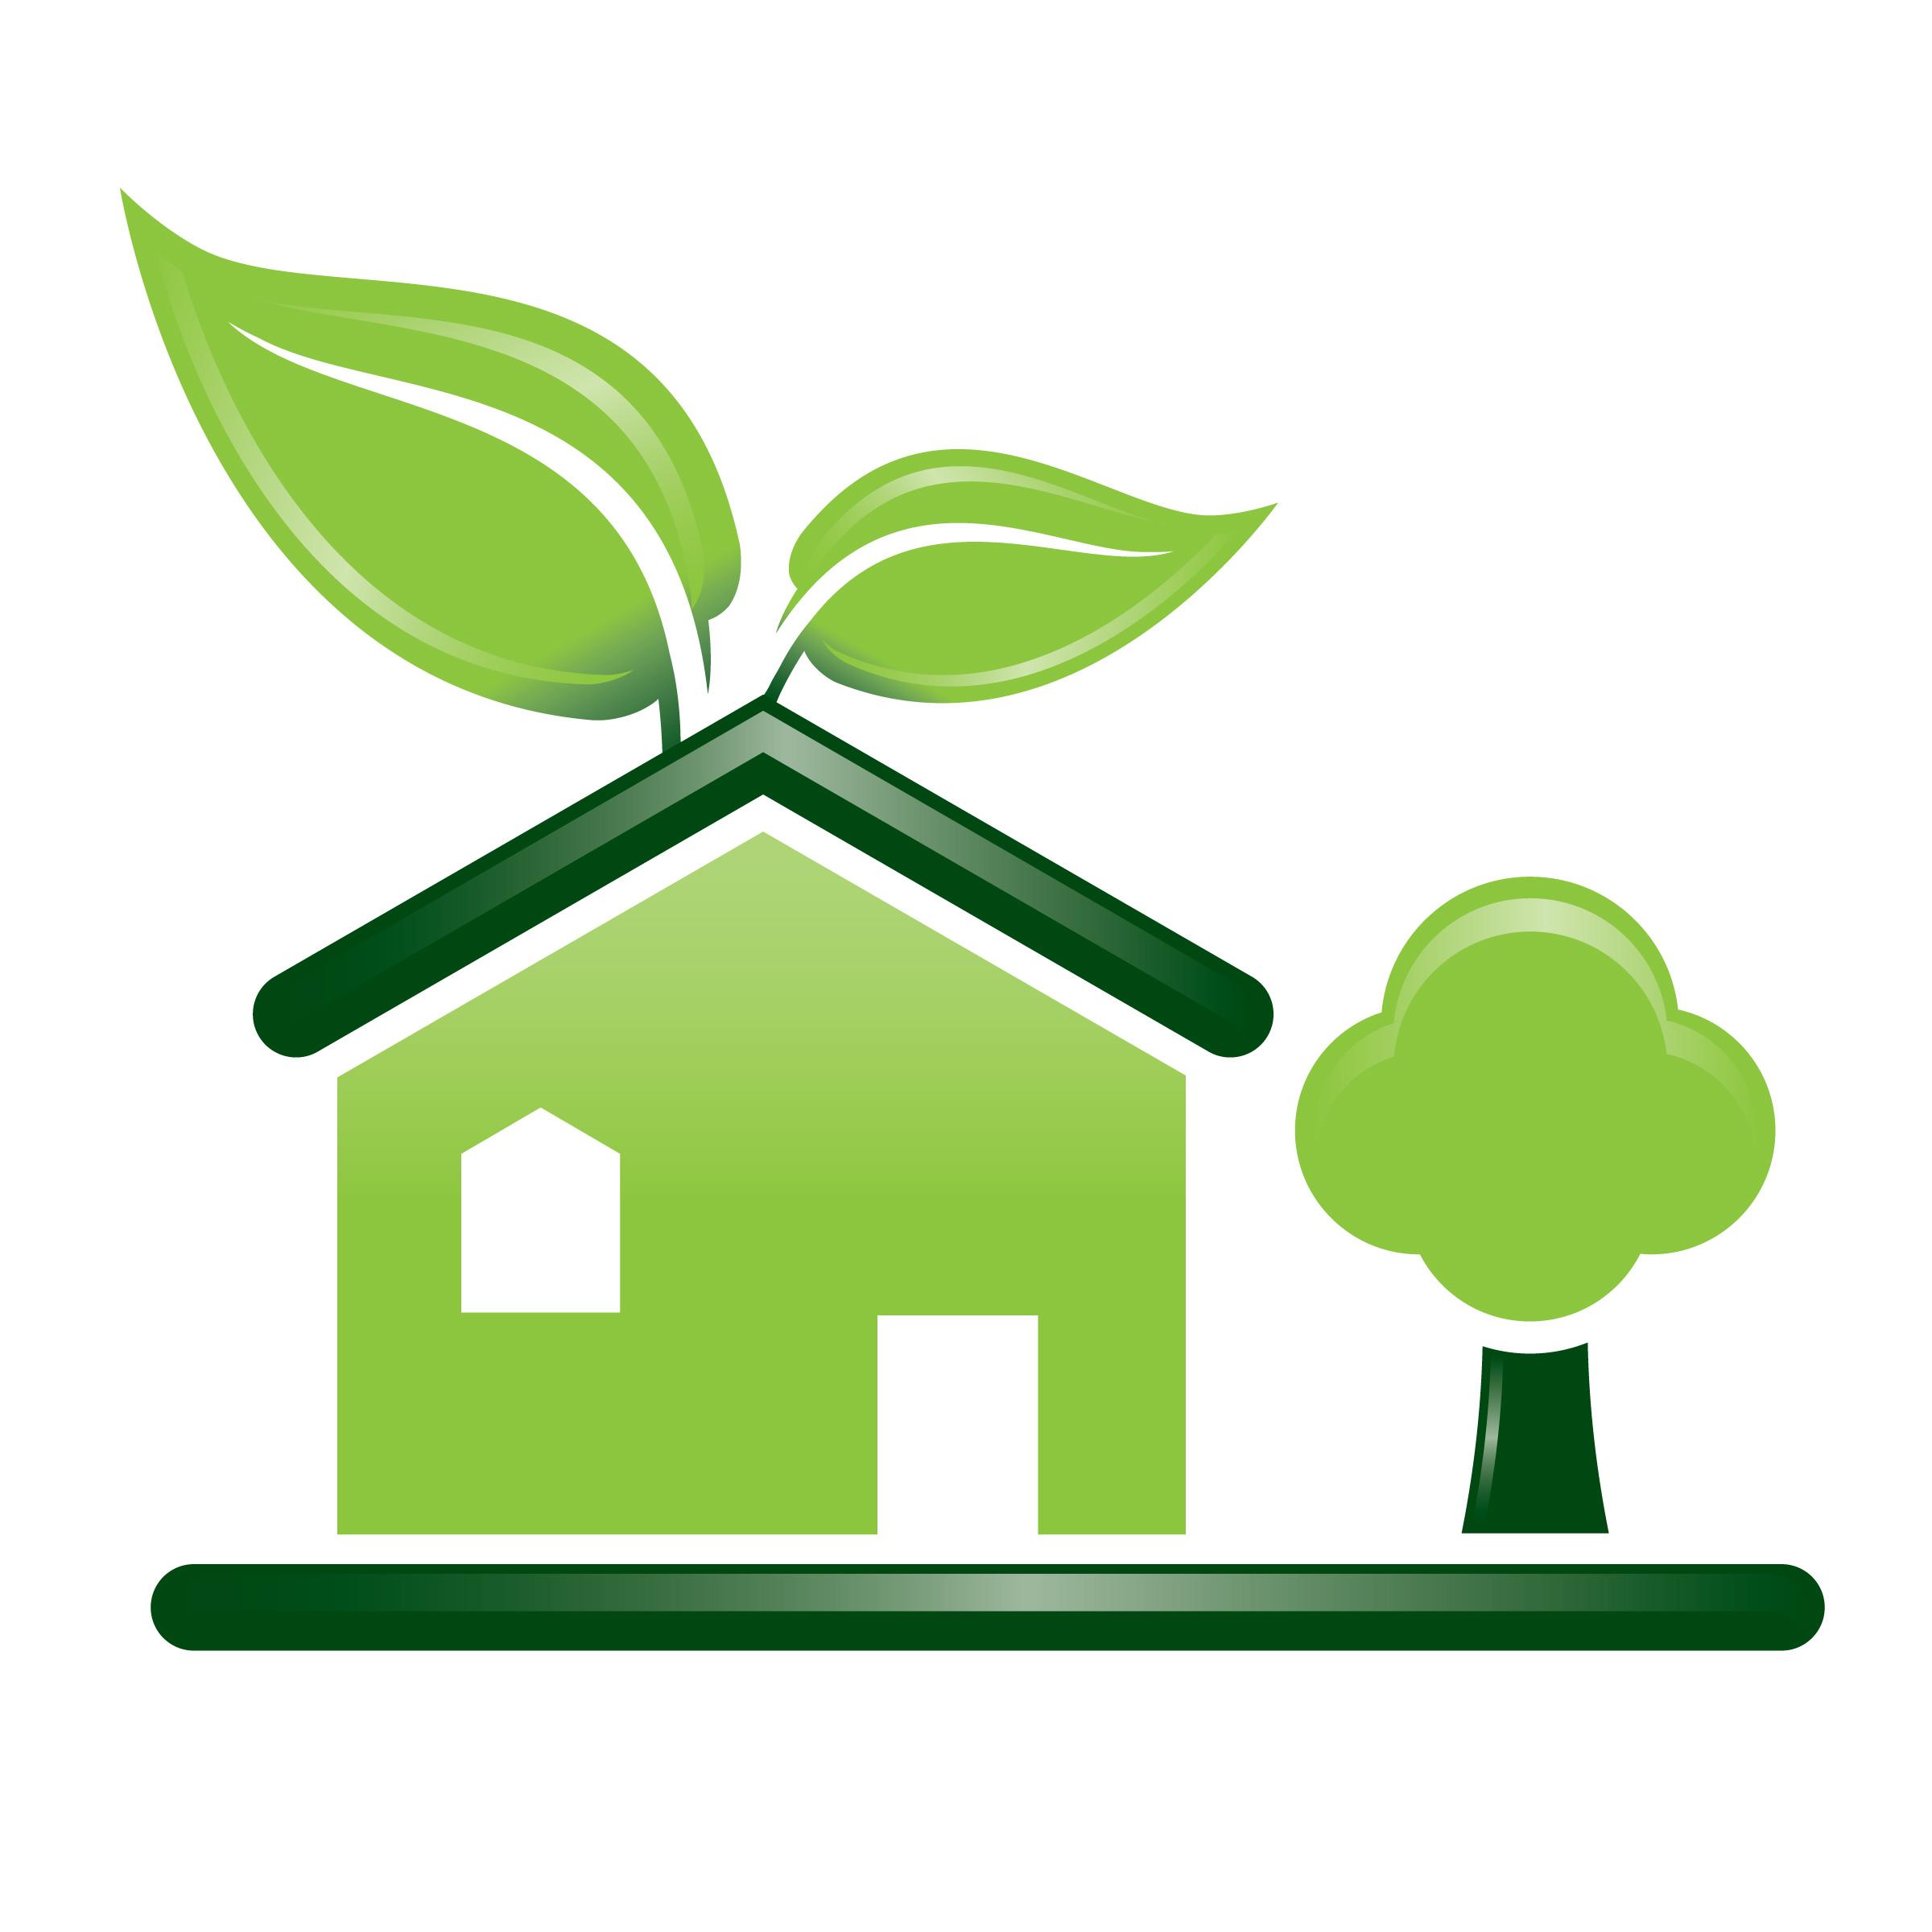 Home Building For Eco Friendly Living.